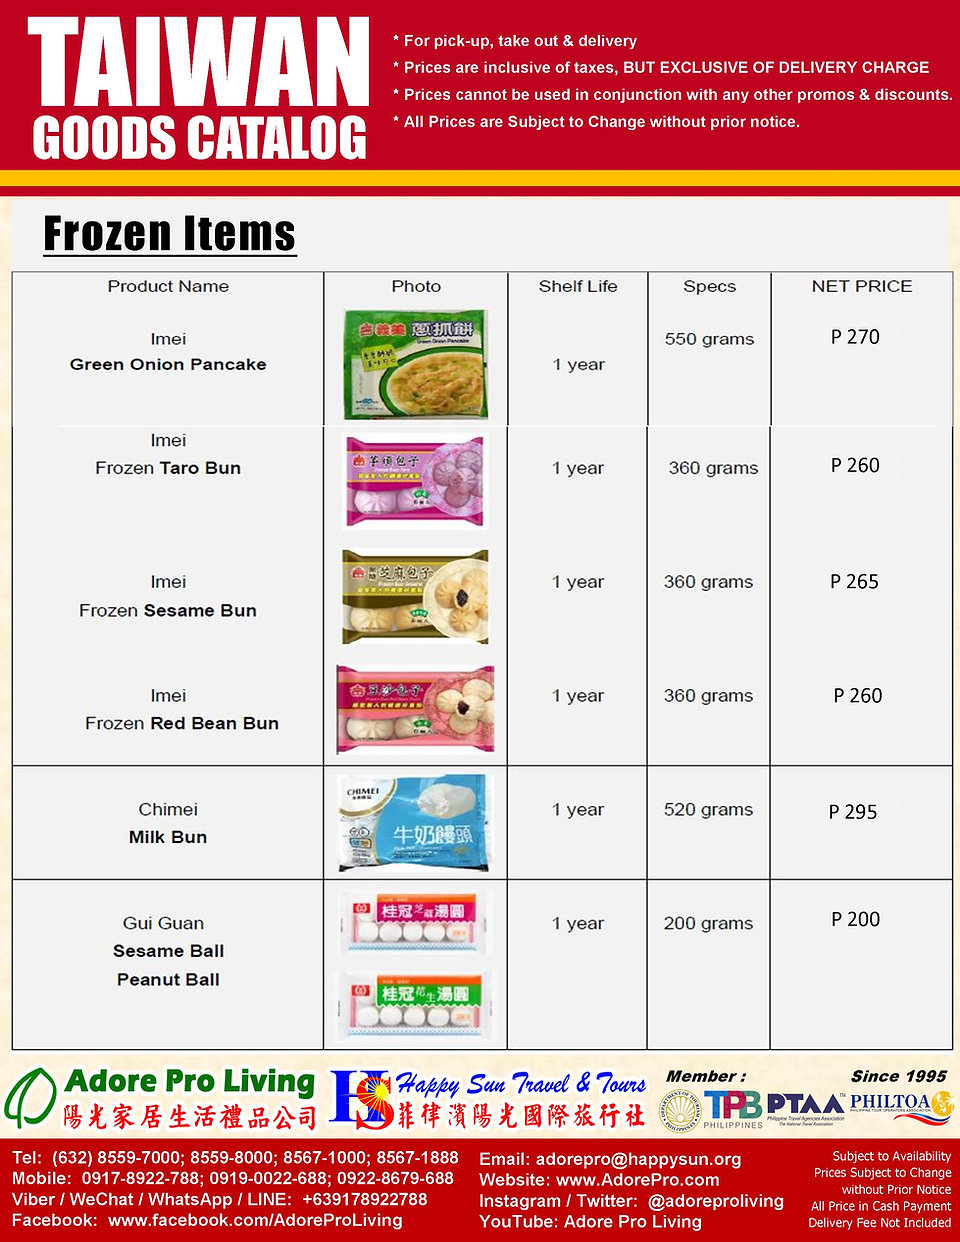 P13_Taiwan Goods Catalog_202009119.jpg